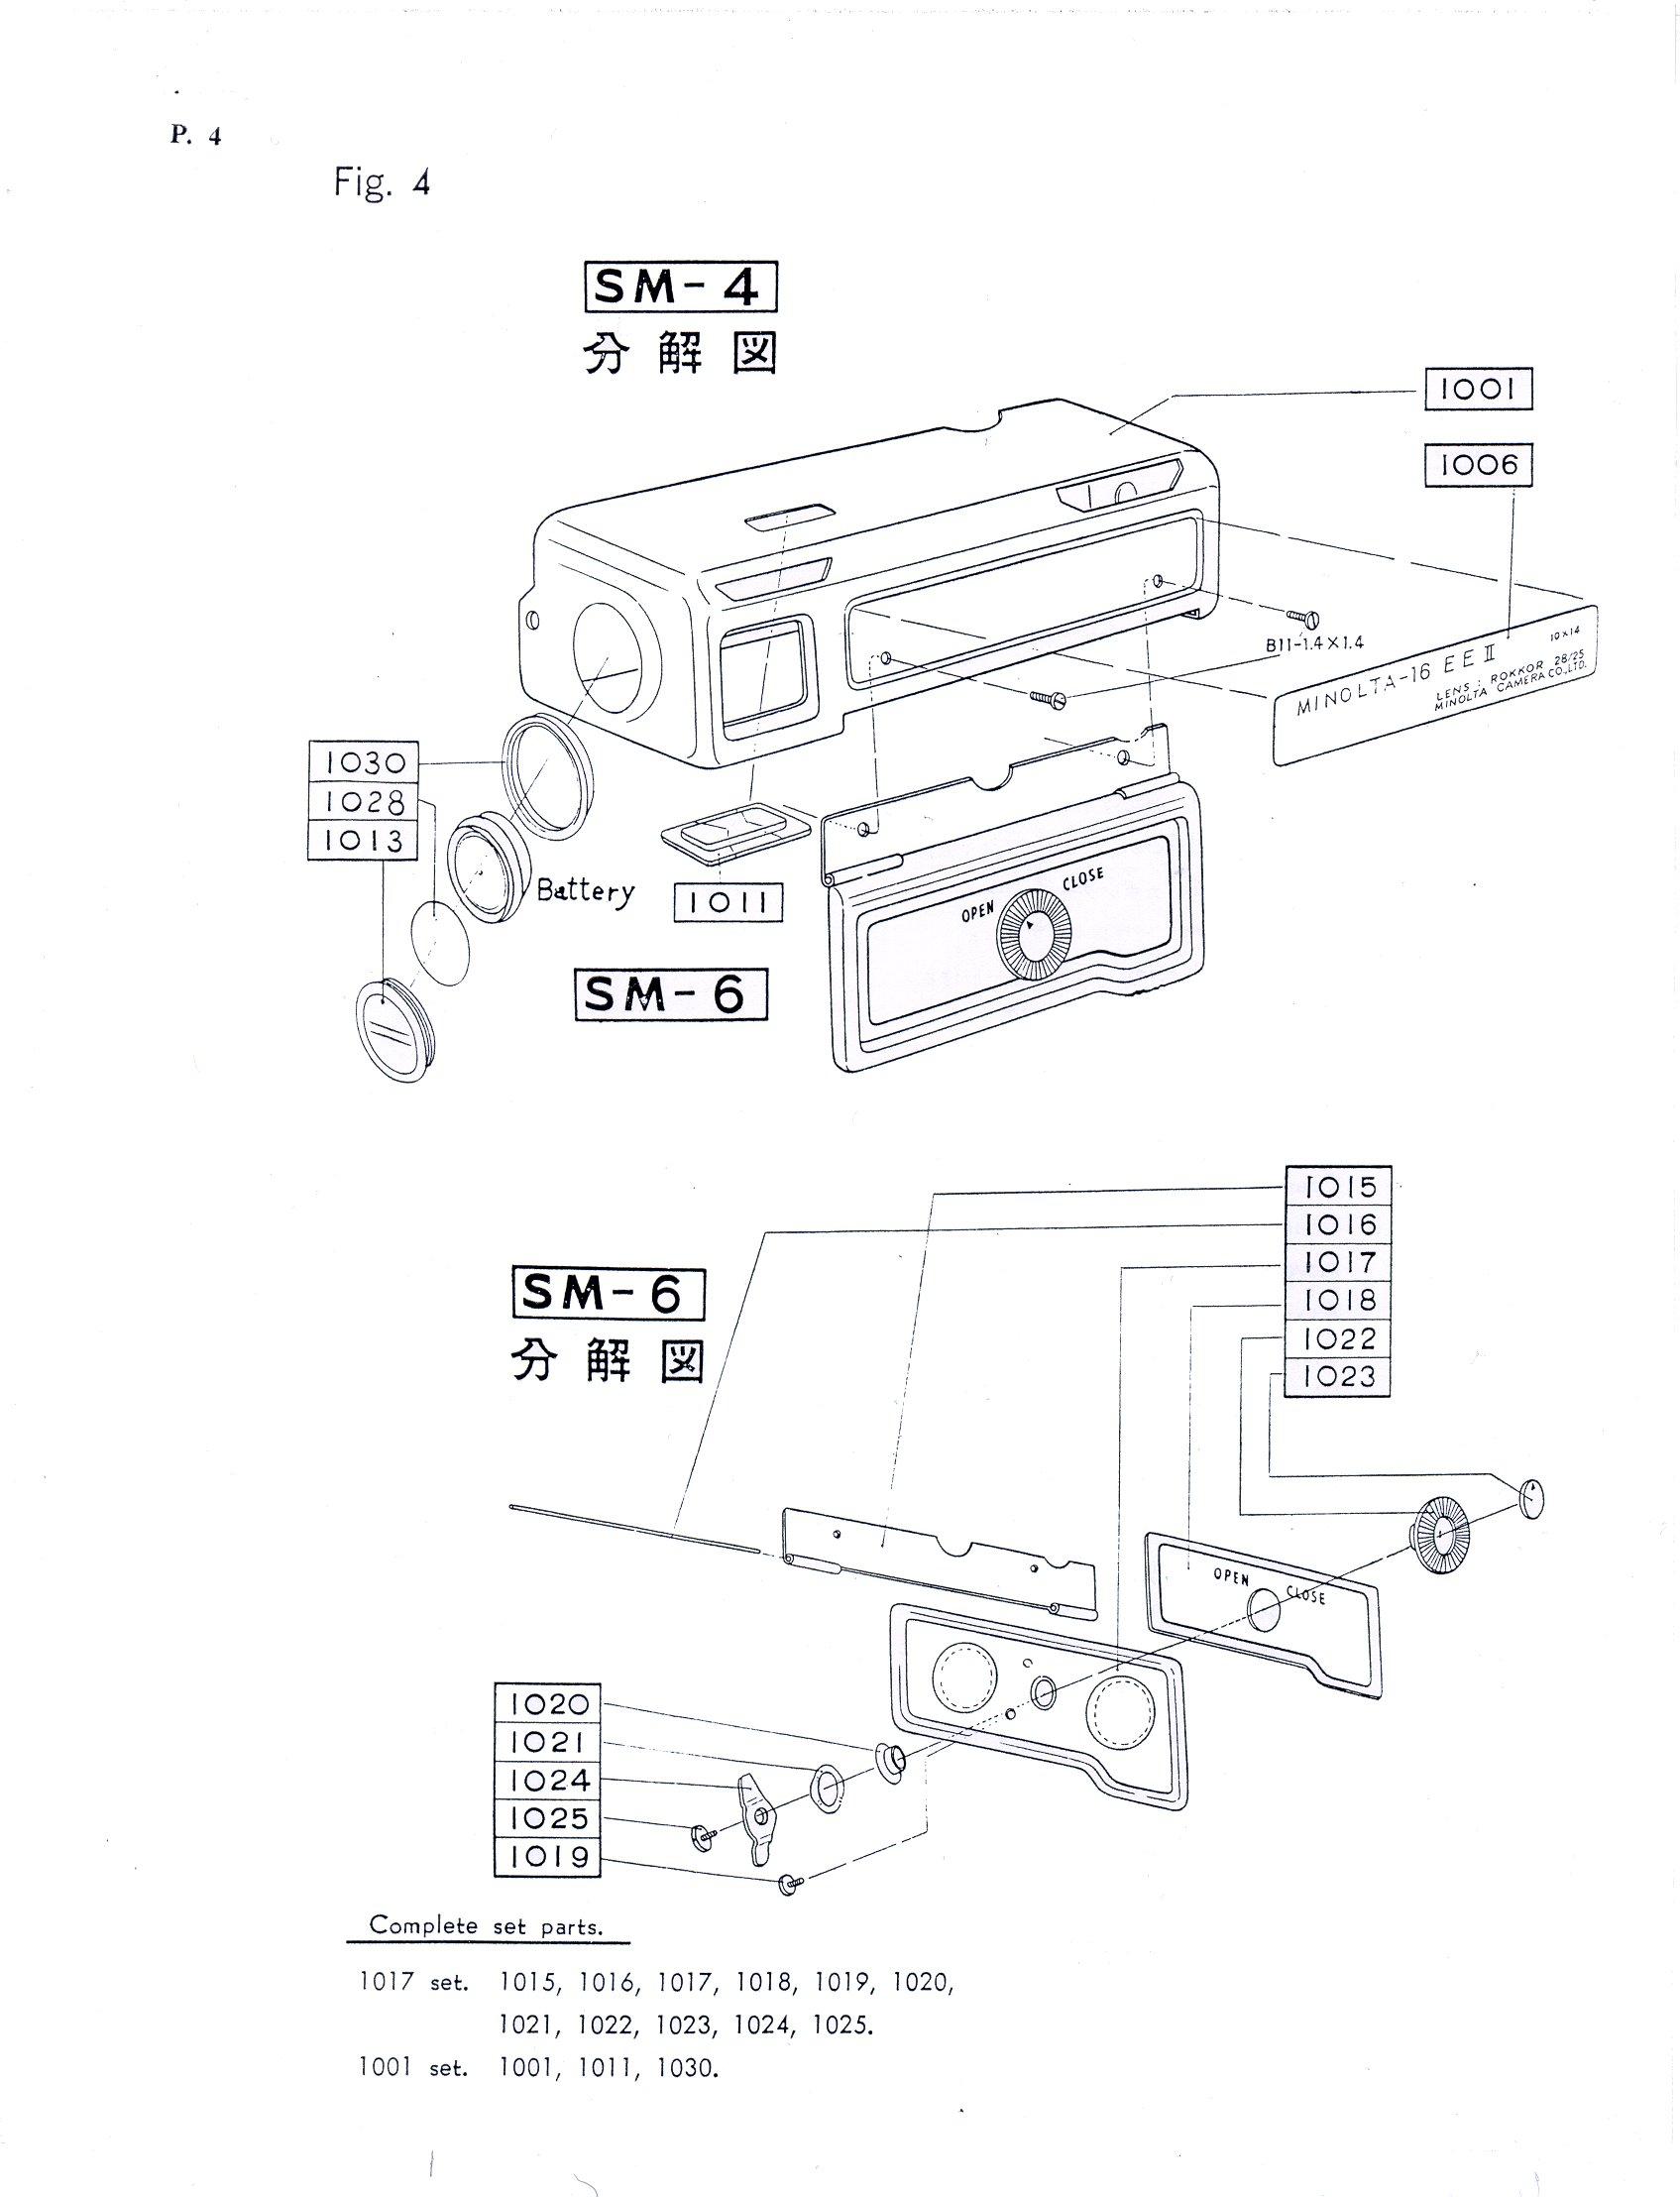 minolta ee service manual rh submin com Generac 6001 LP5500 Generac 6001 LP5500